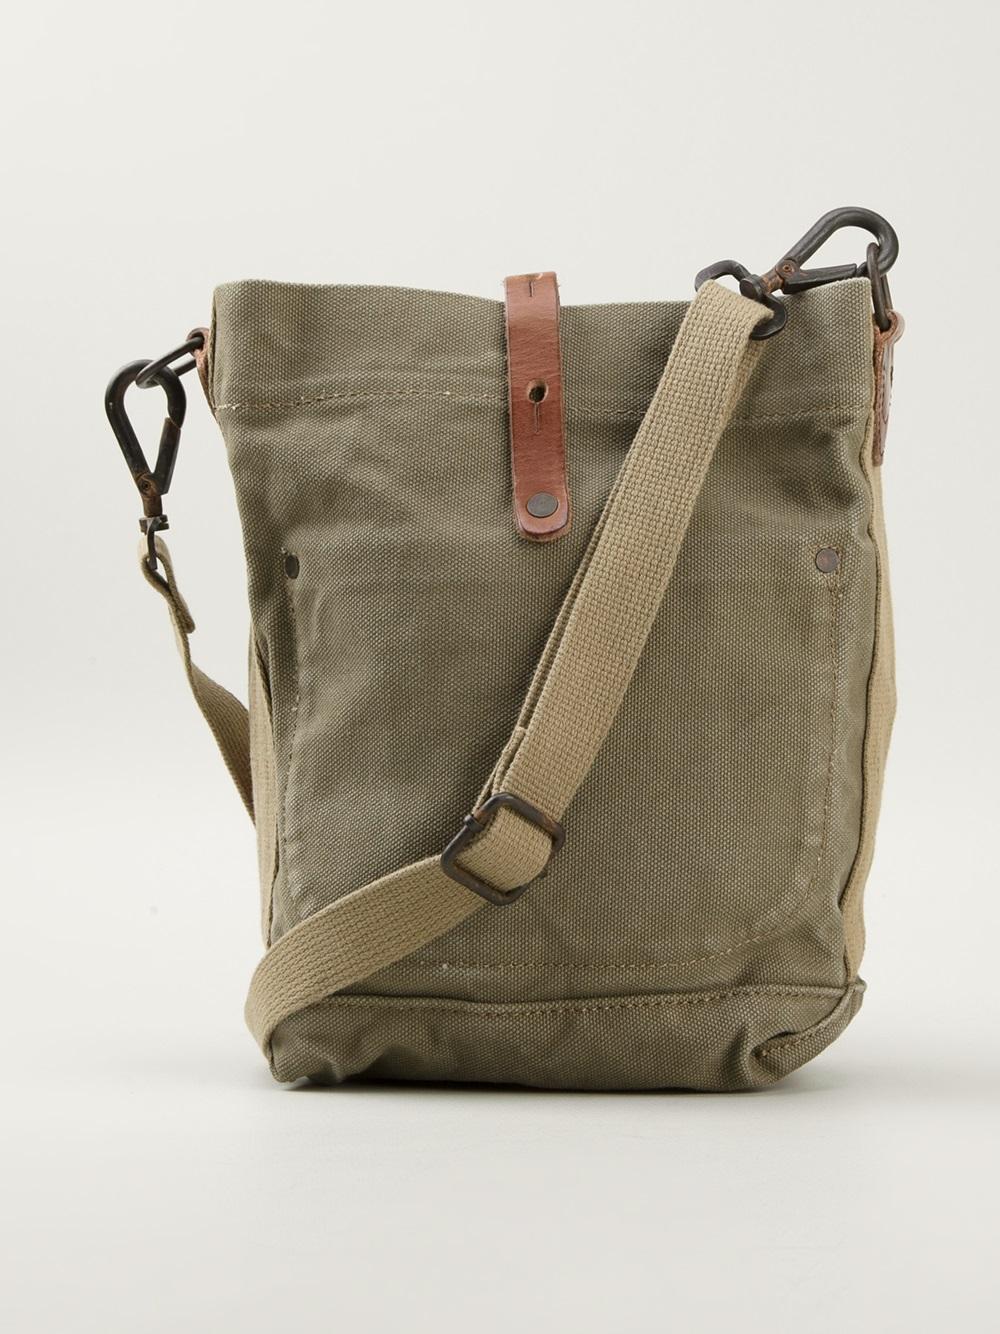 c2ac3b02b8d2 Lyst - Ralph Lauren Stars and Stripes Shoulder Bag in Green for Men